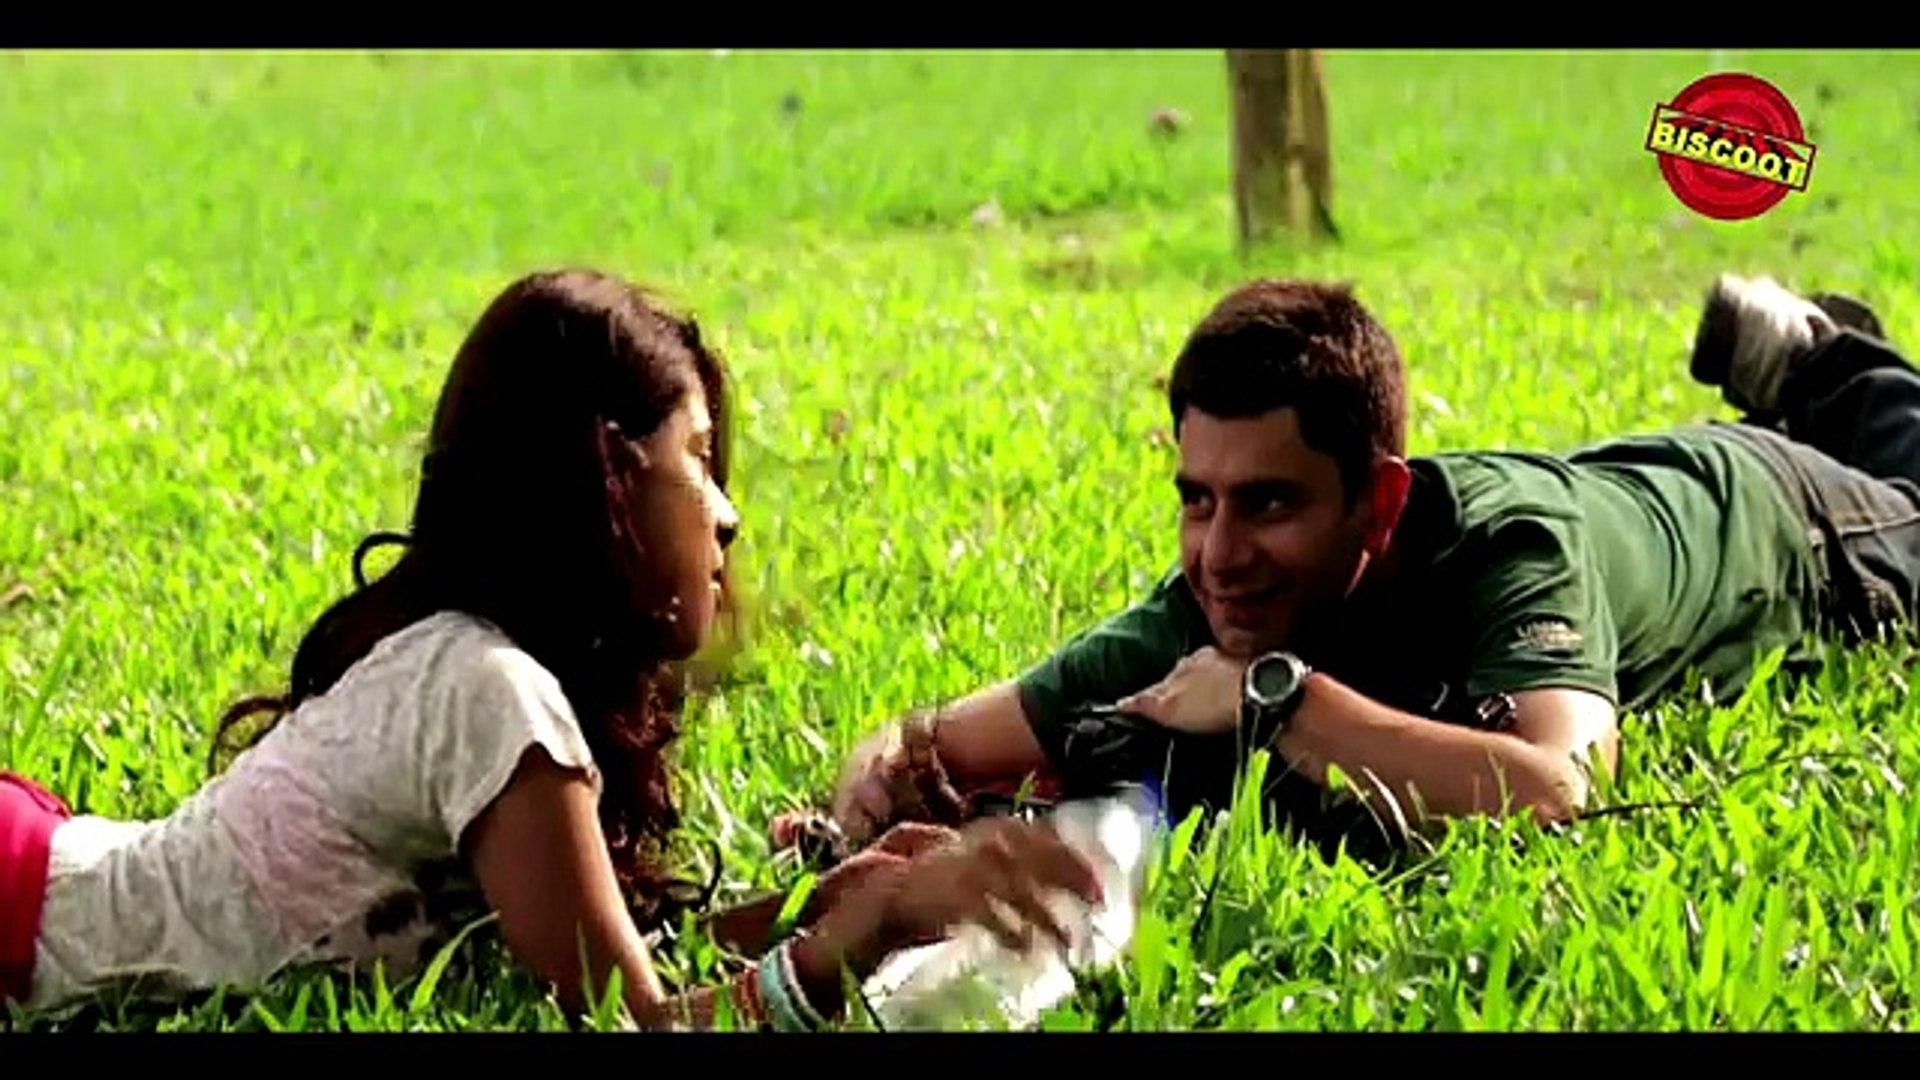 Jahan Tum Ho Hindi Movies Songs - Coffee Bloom 2015 Hindi Movie